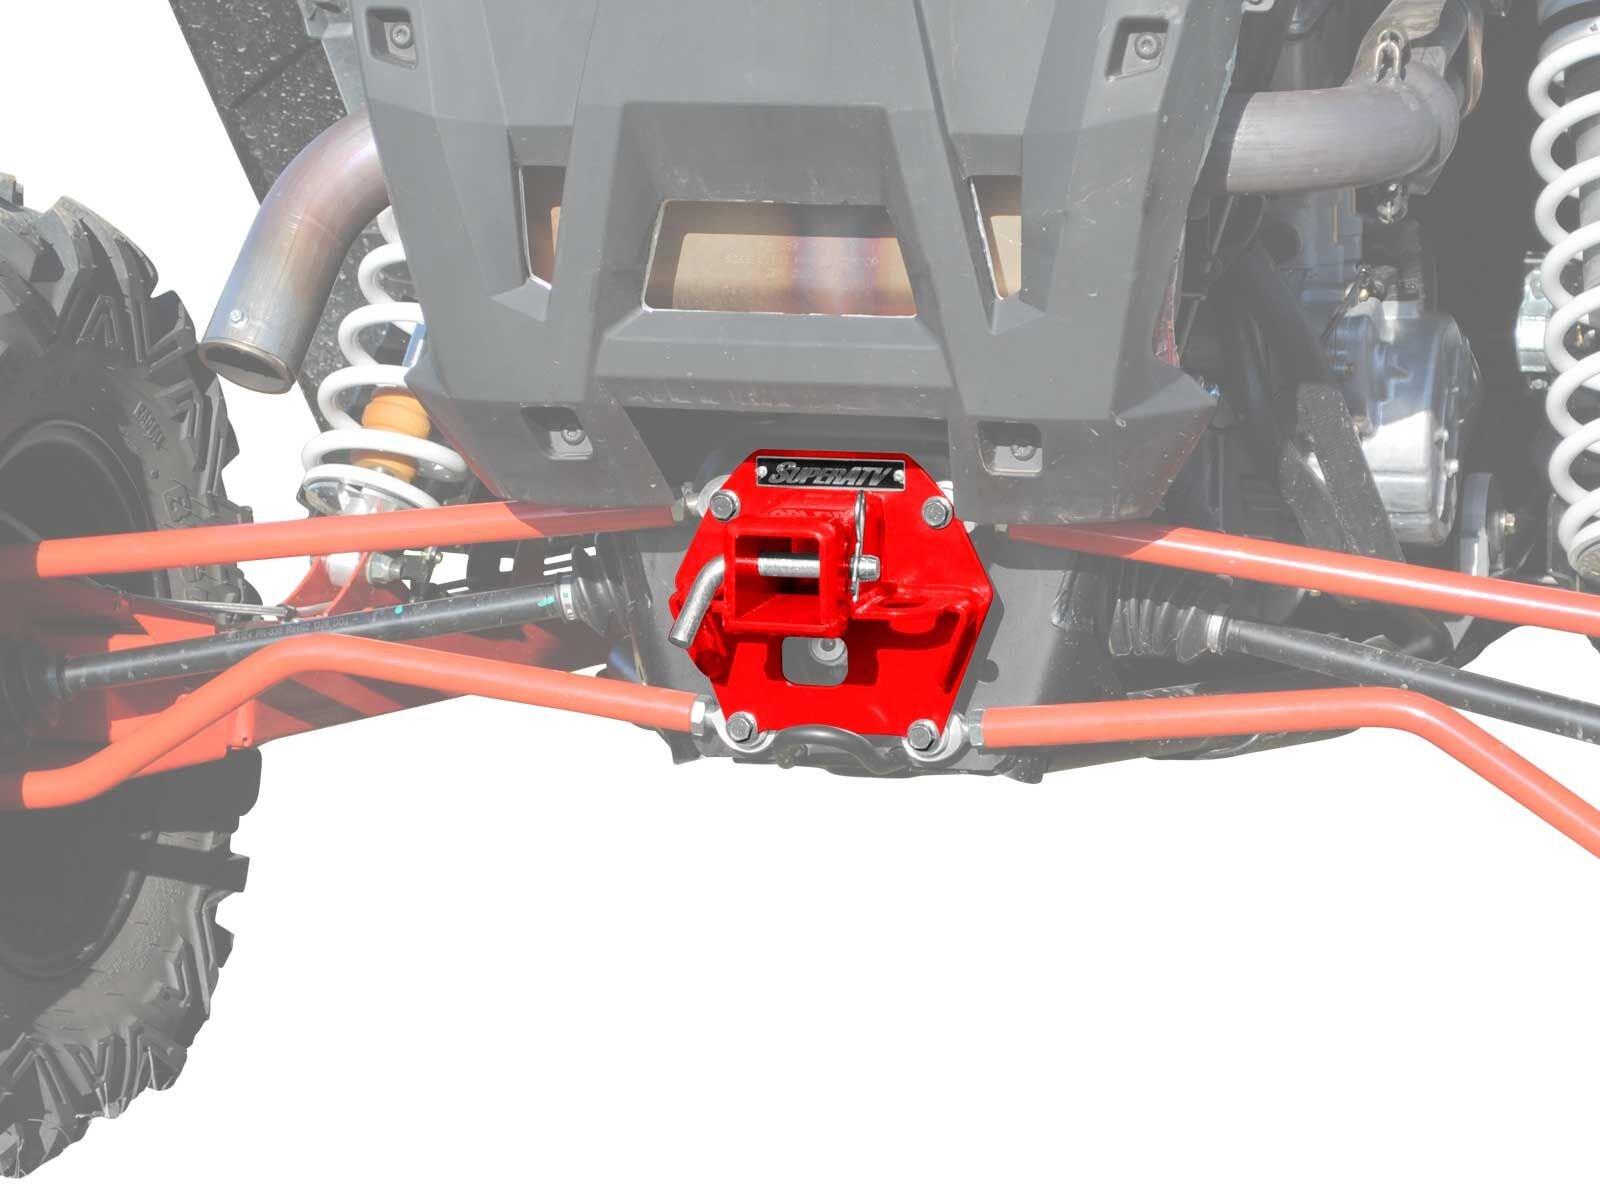 SuperATV 2'' Rear Receiver Hitch for Polaris RZR XP 1000 / XP 4 1000 (2014-2016) - Red by SuperATV.com